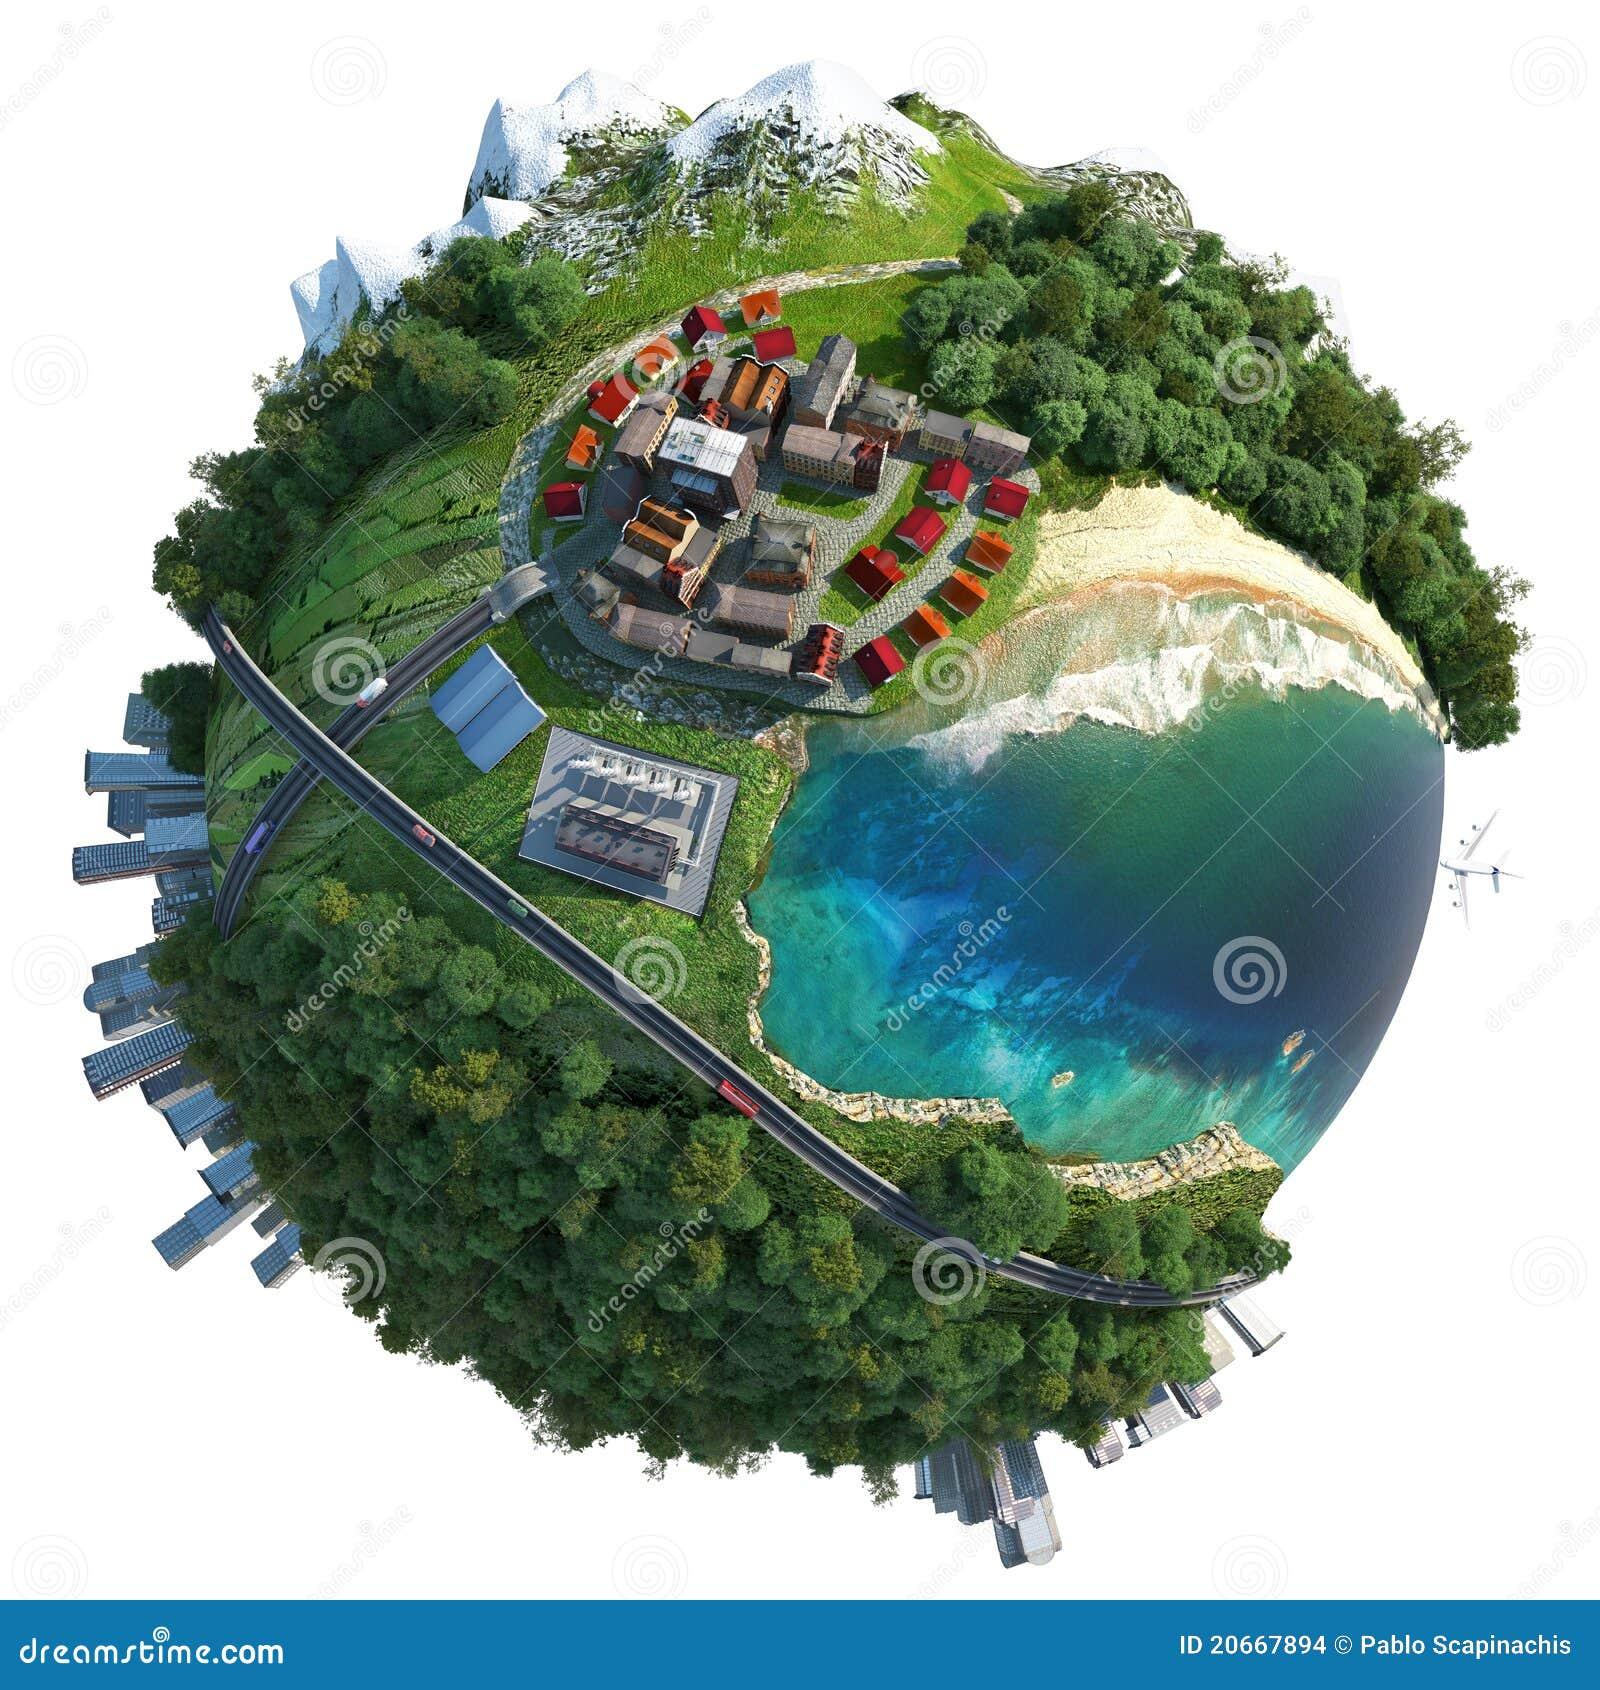 Environmental Concept Earthfriendly Landscapes: Miniature Globe Landscape Diversity Stock Illustration